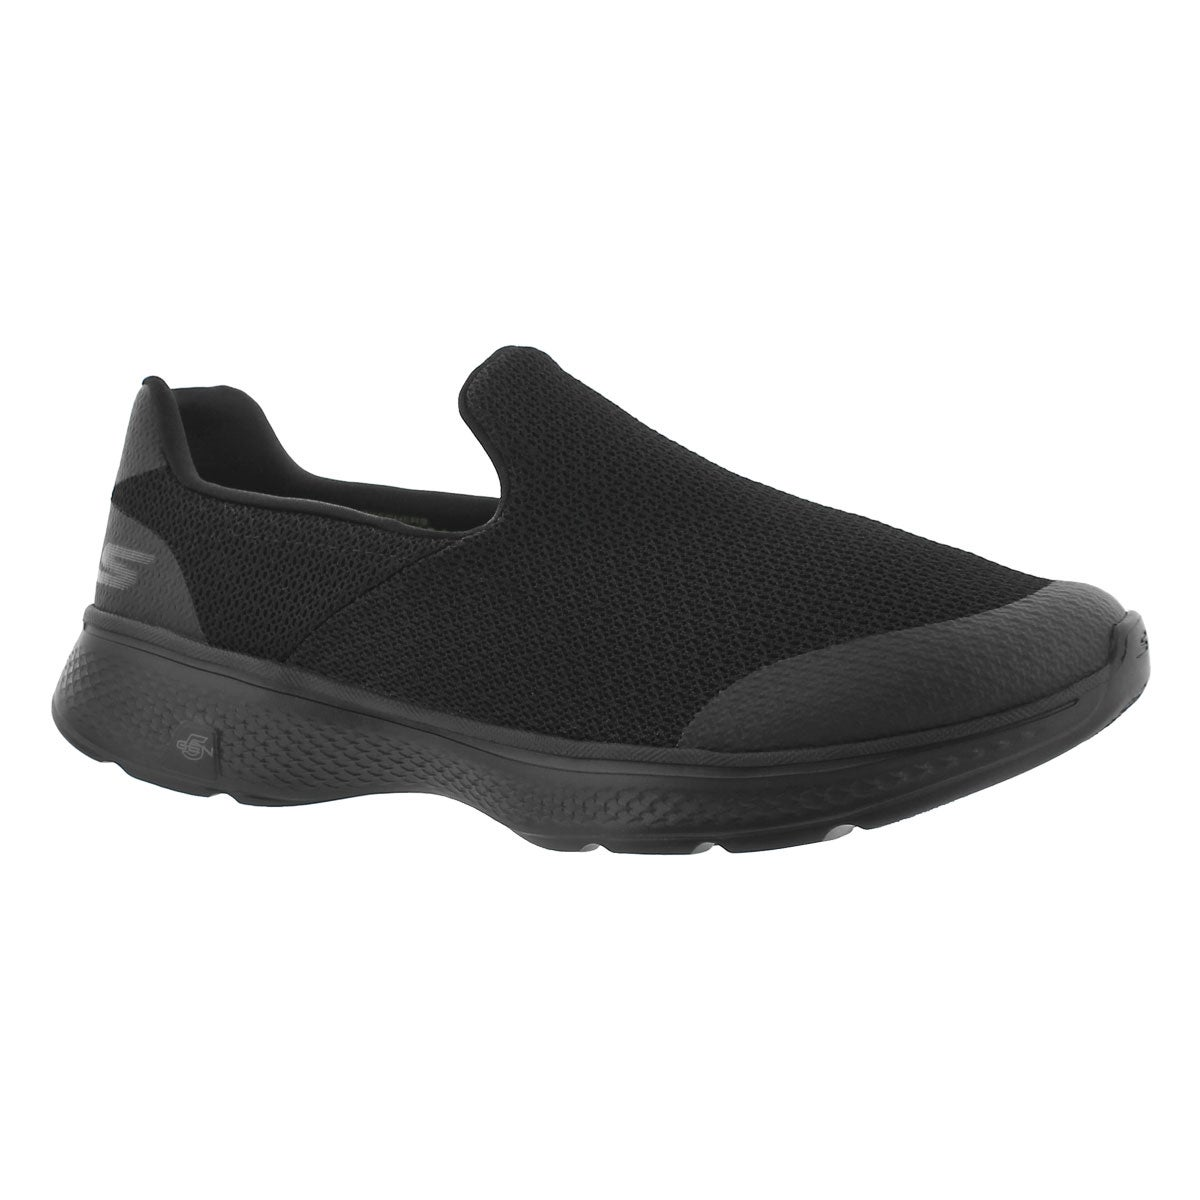 Mns GOwalk 4 Expert blk slip on shoe